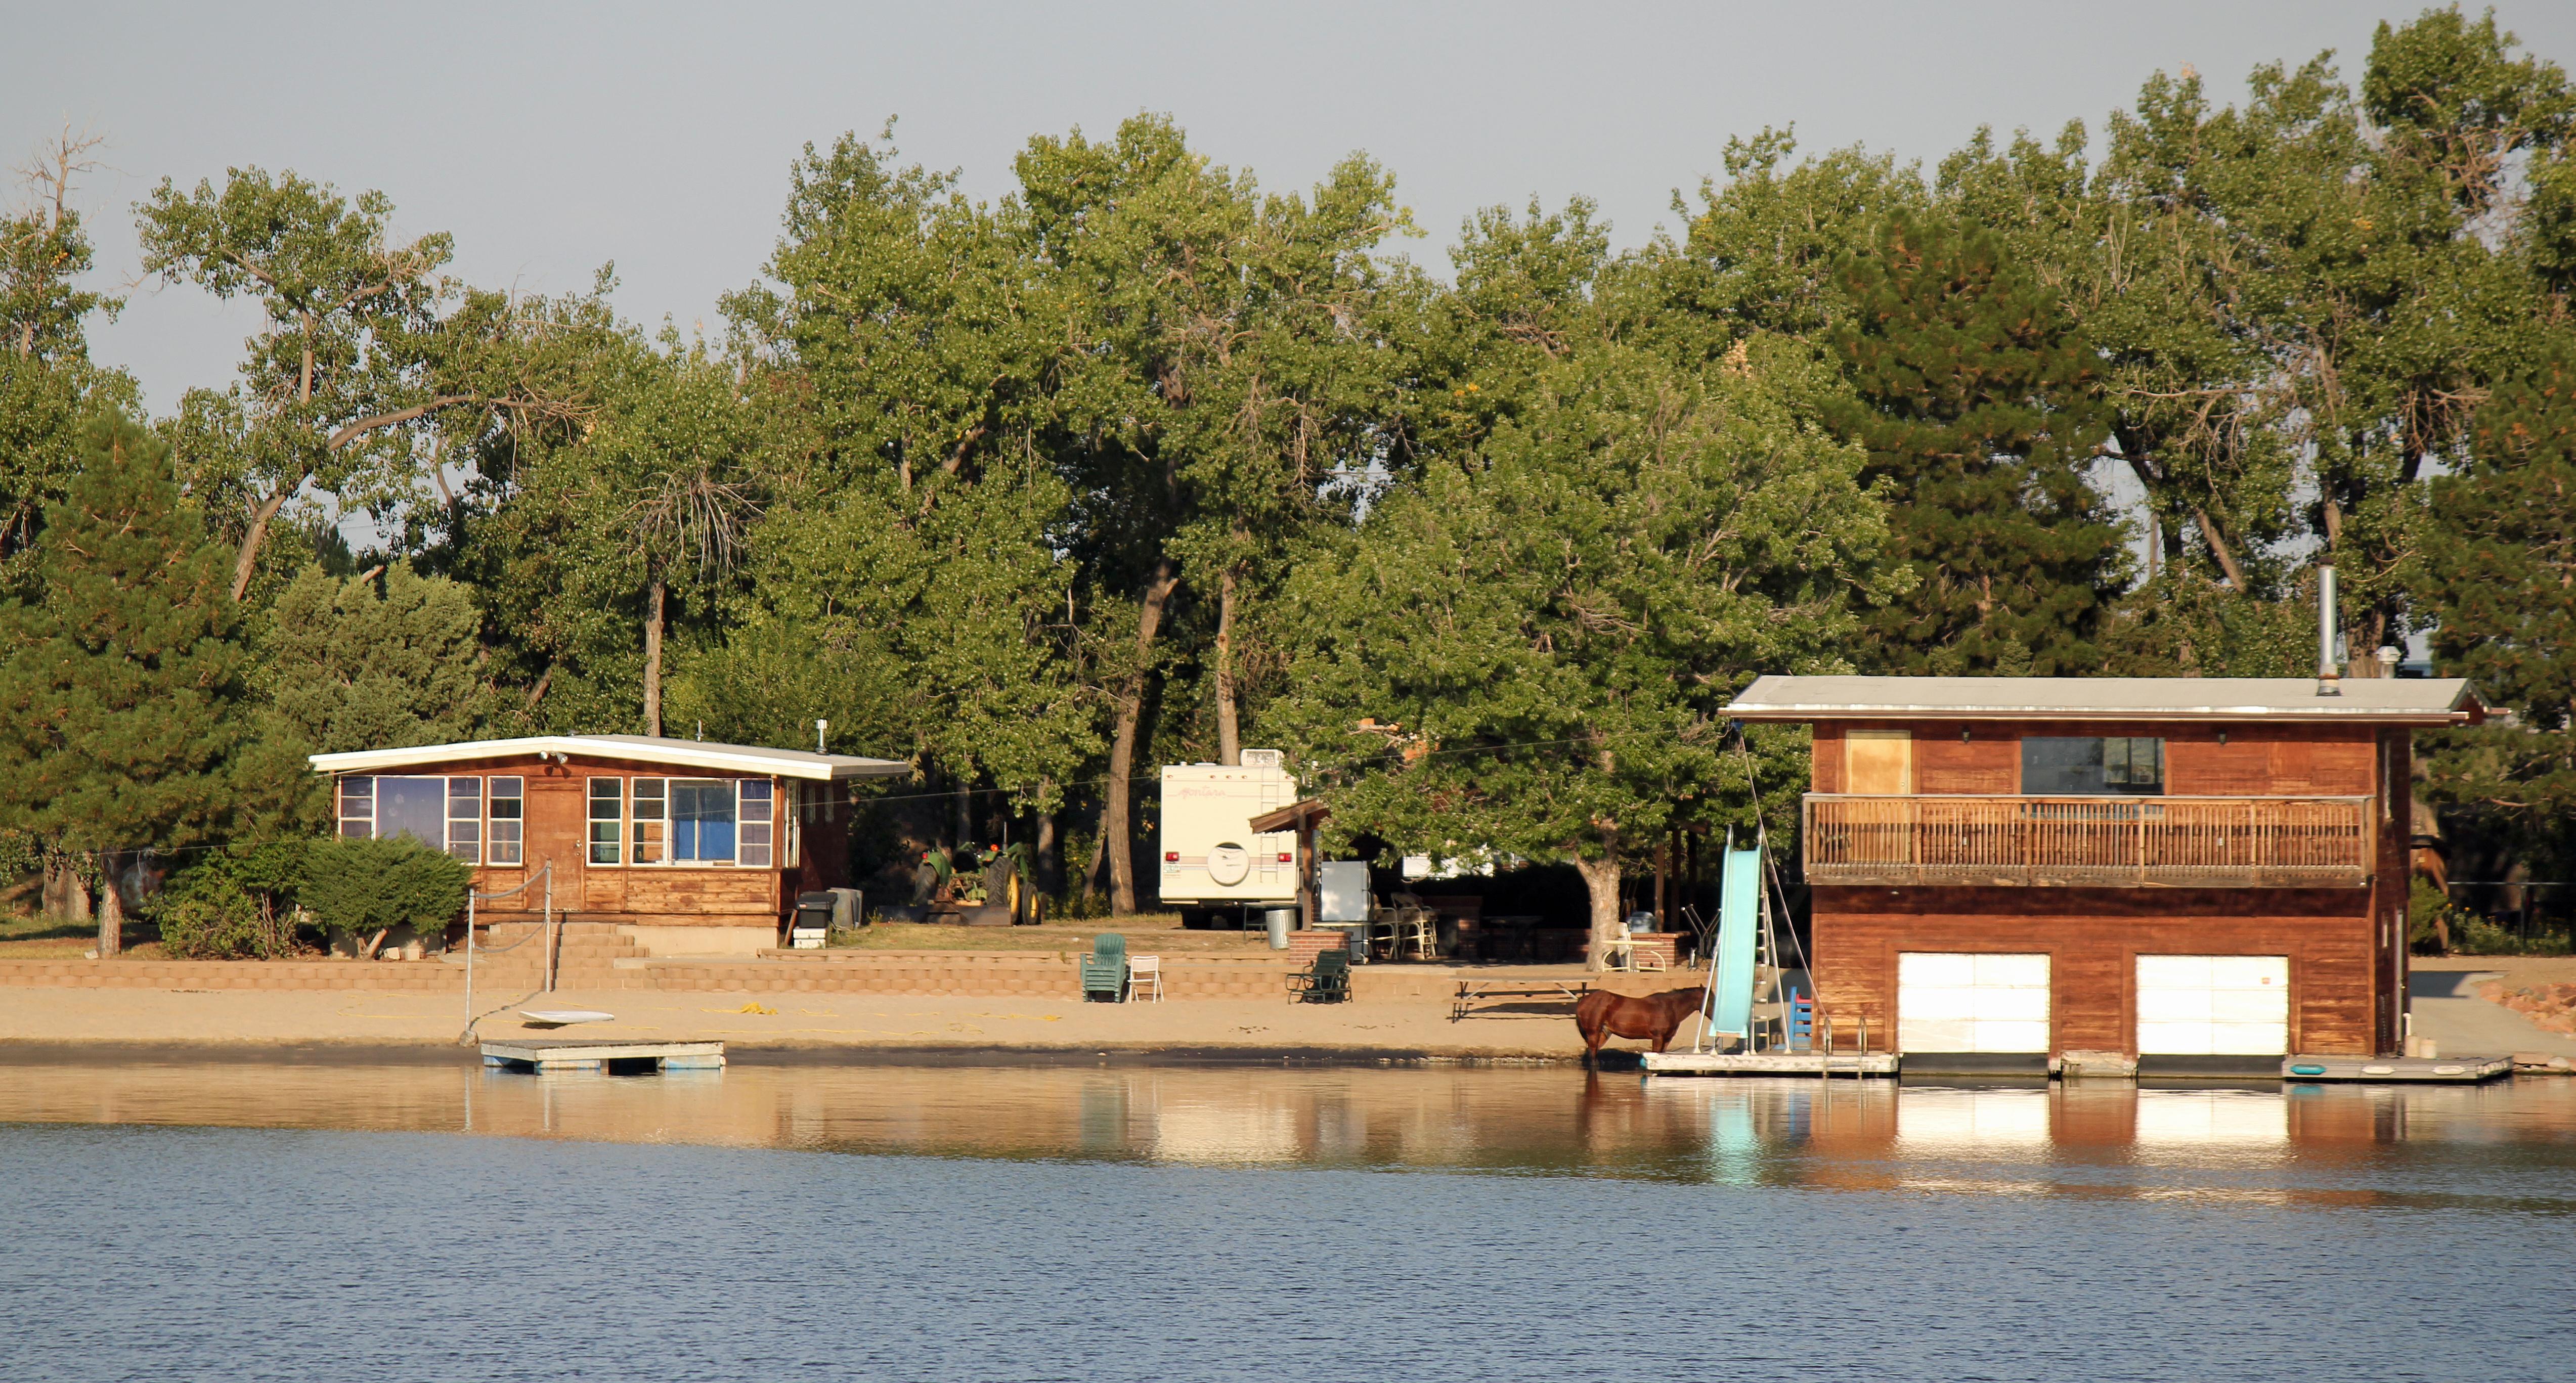 file brannan sand and gravel pit no 8 lake sangraco boathouse